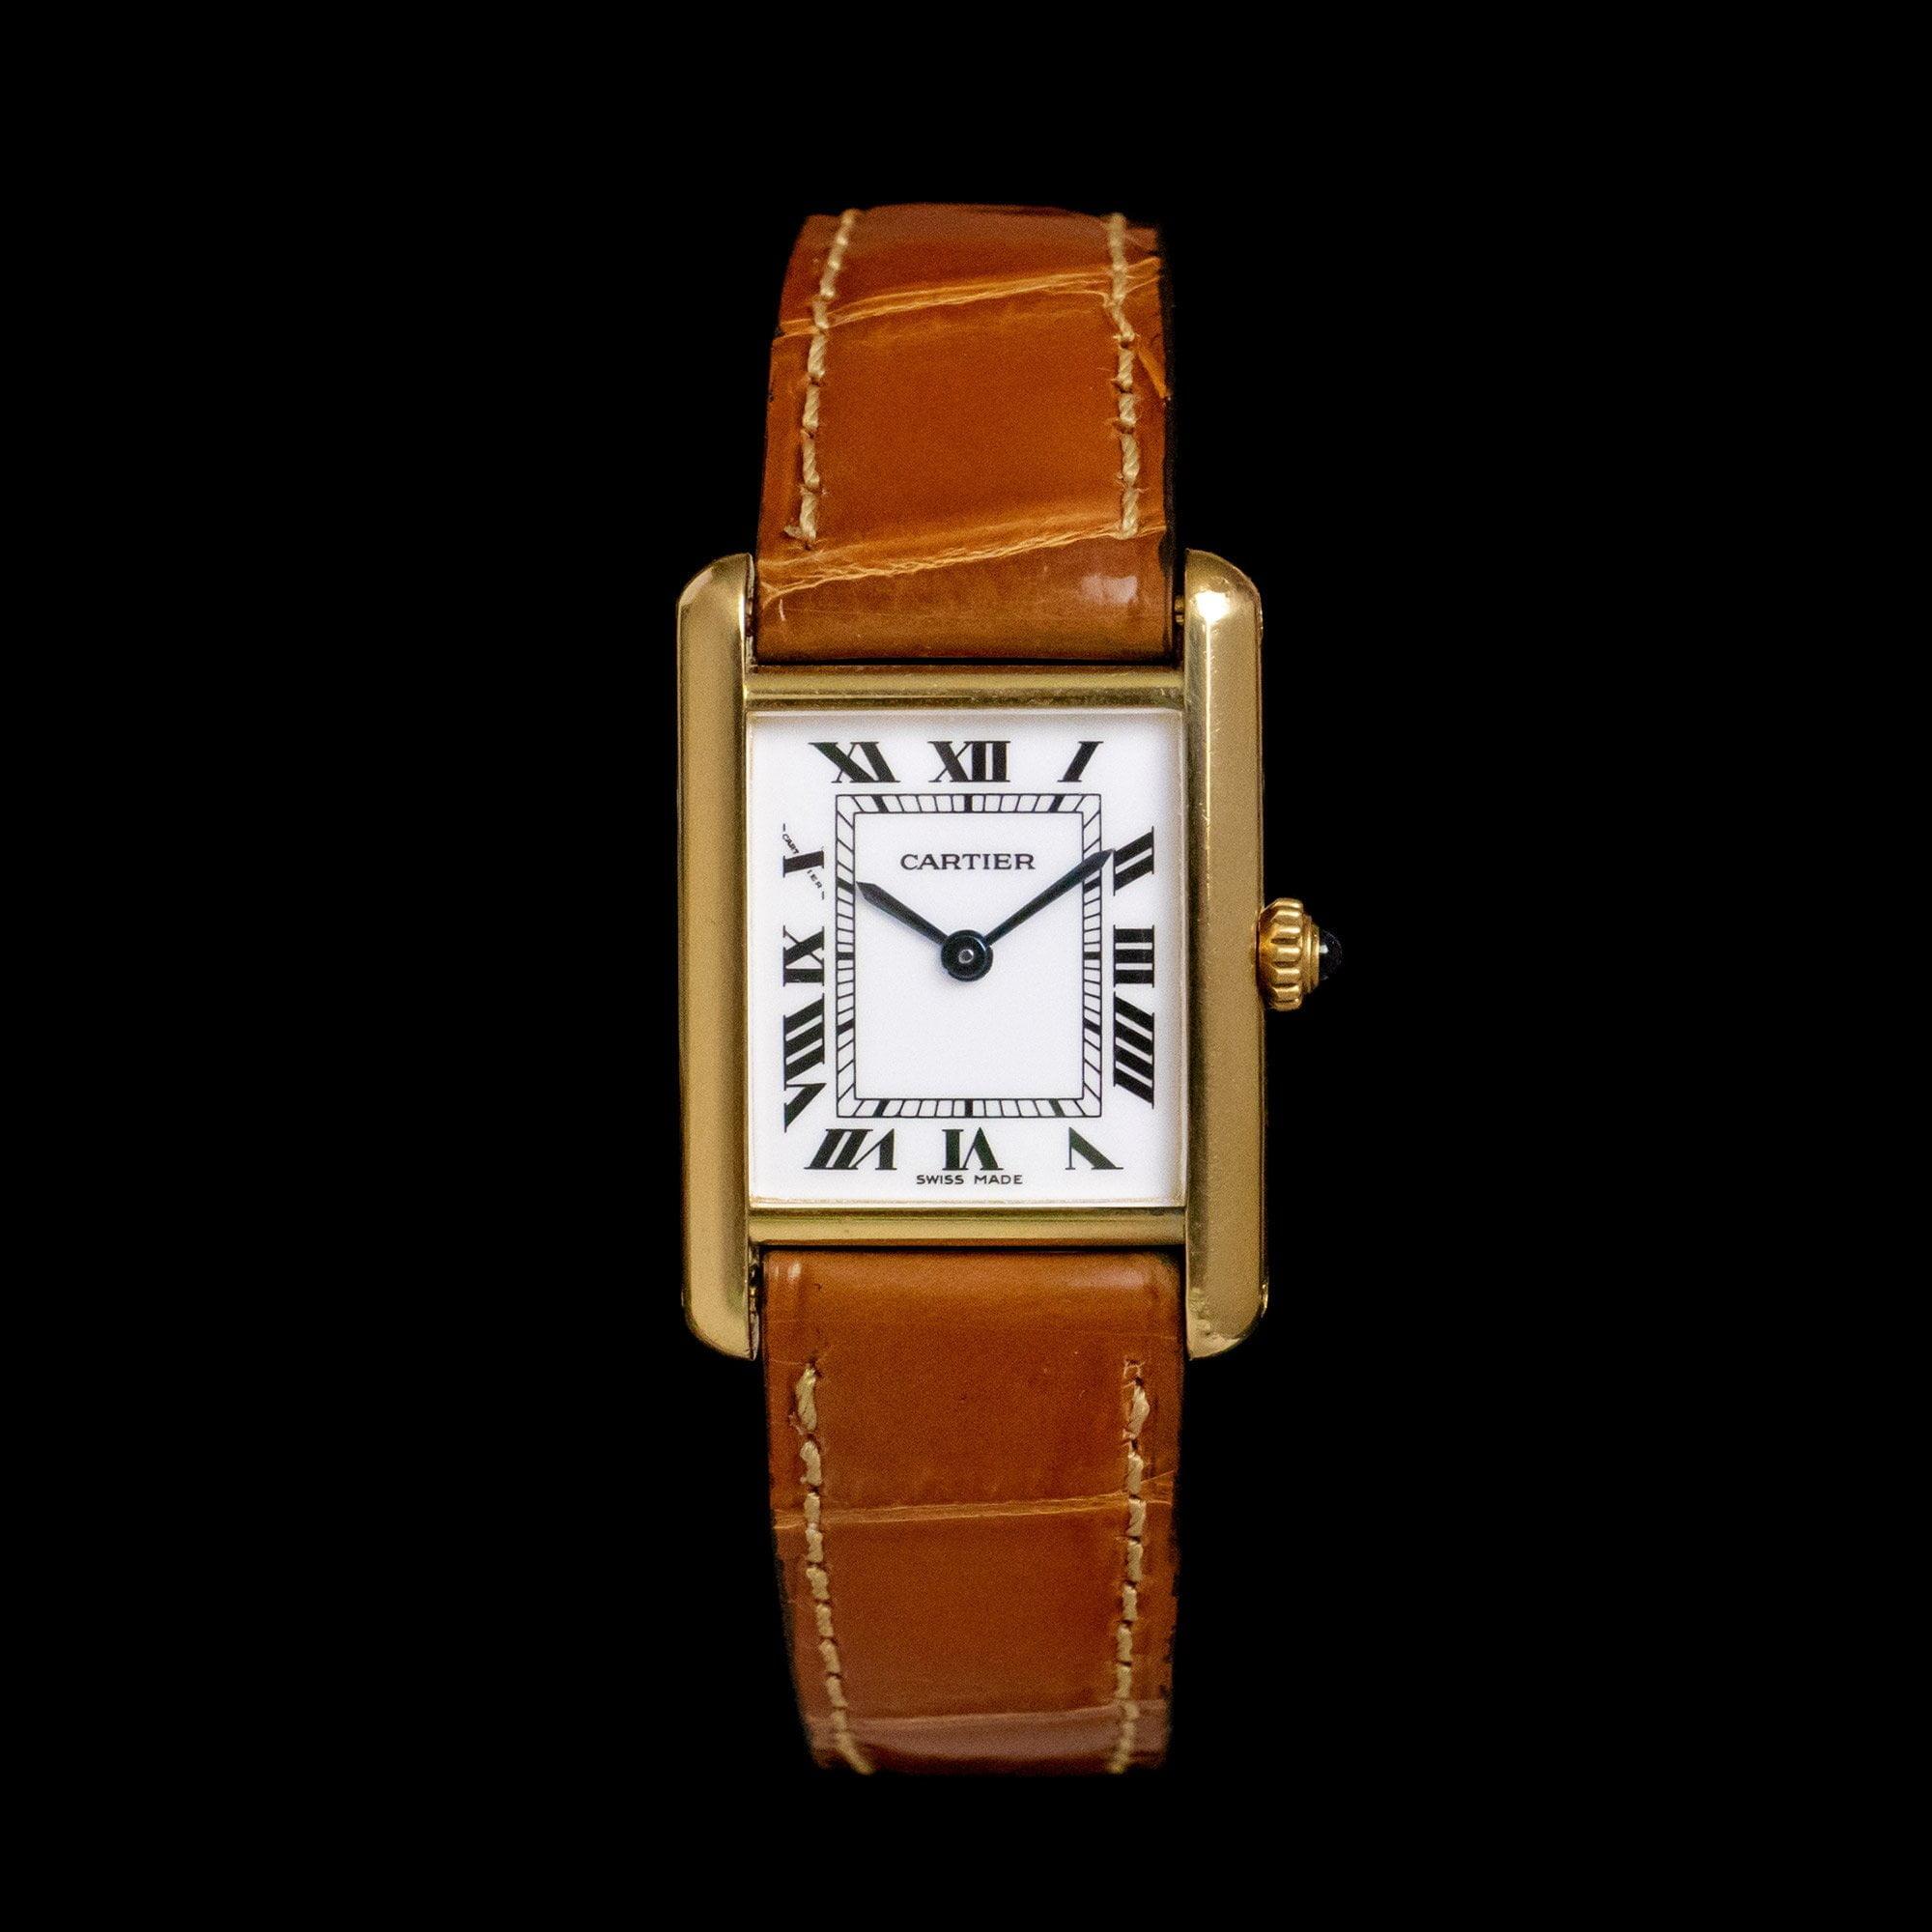 Cartier Tank Louis - AMSTERDAM VINTAGE WATCHES